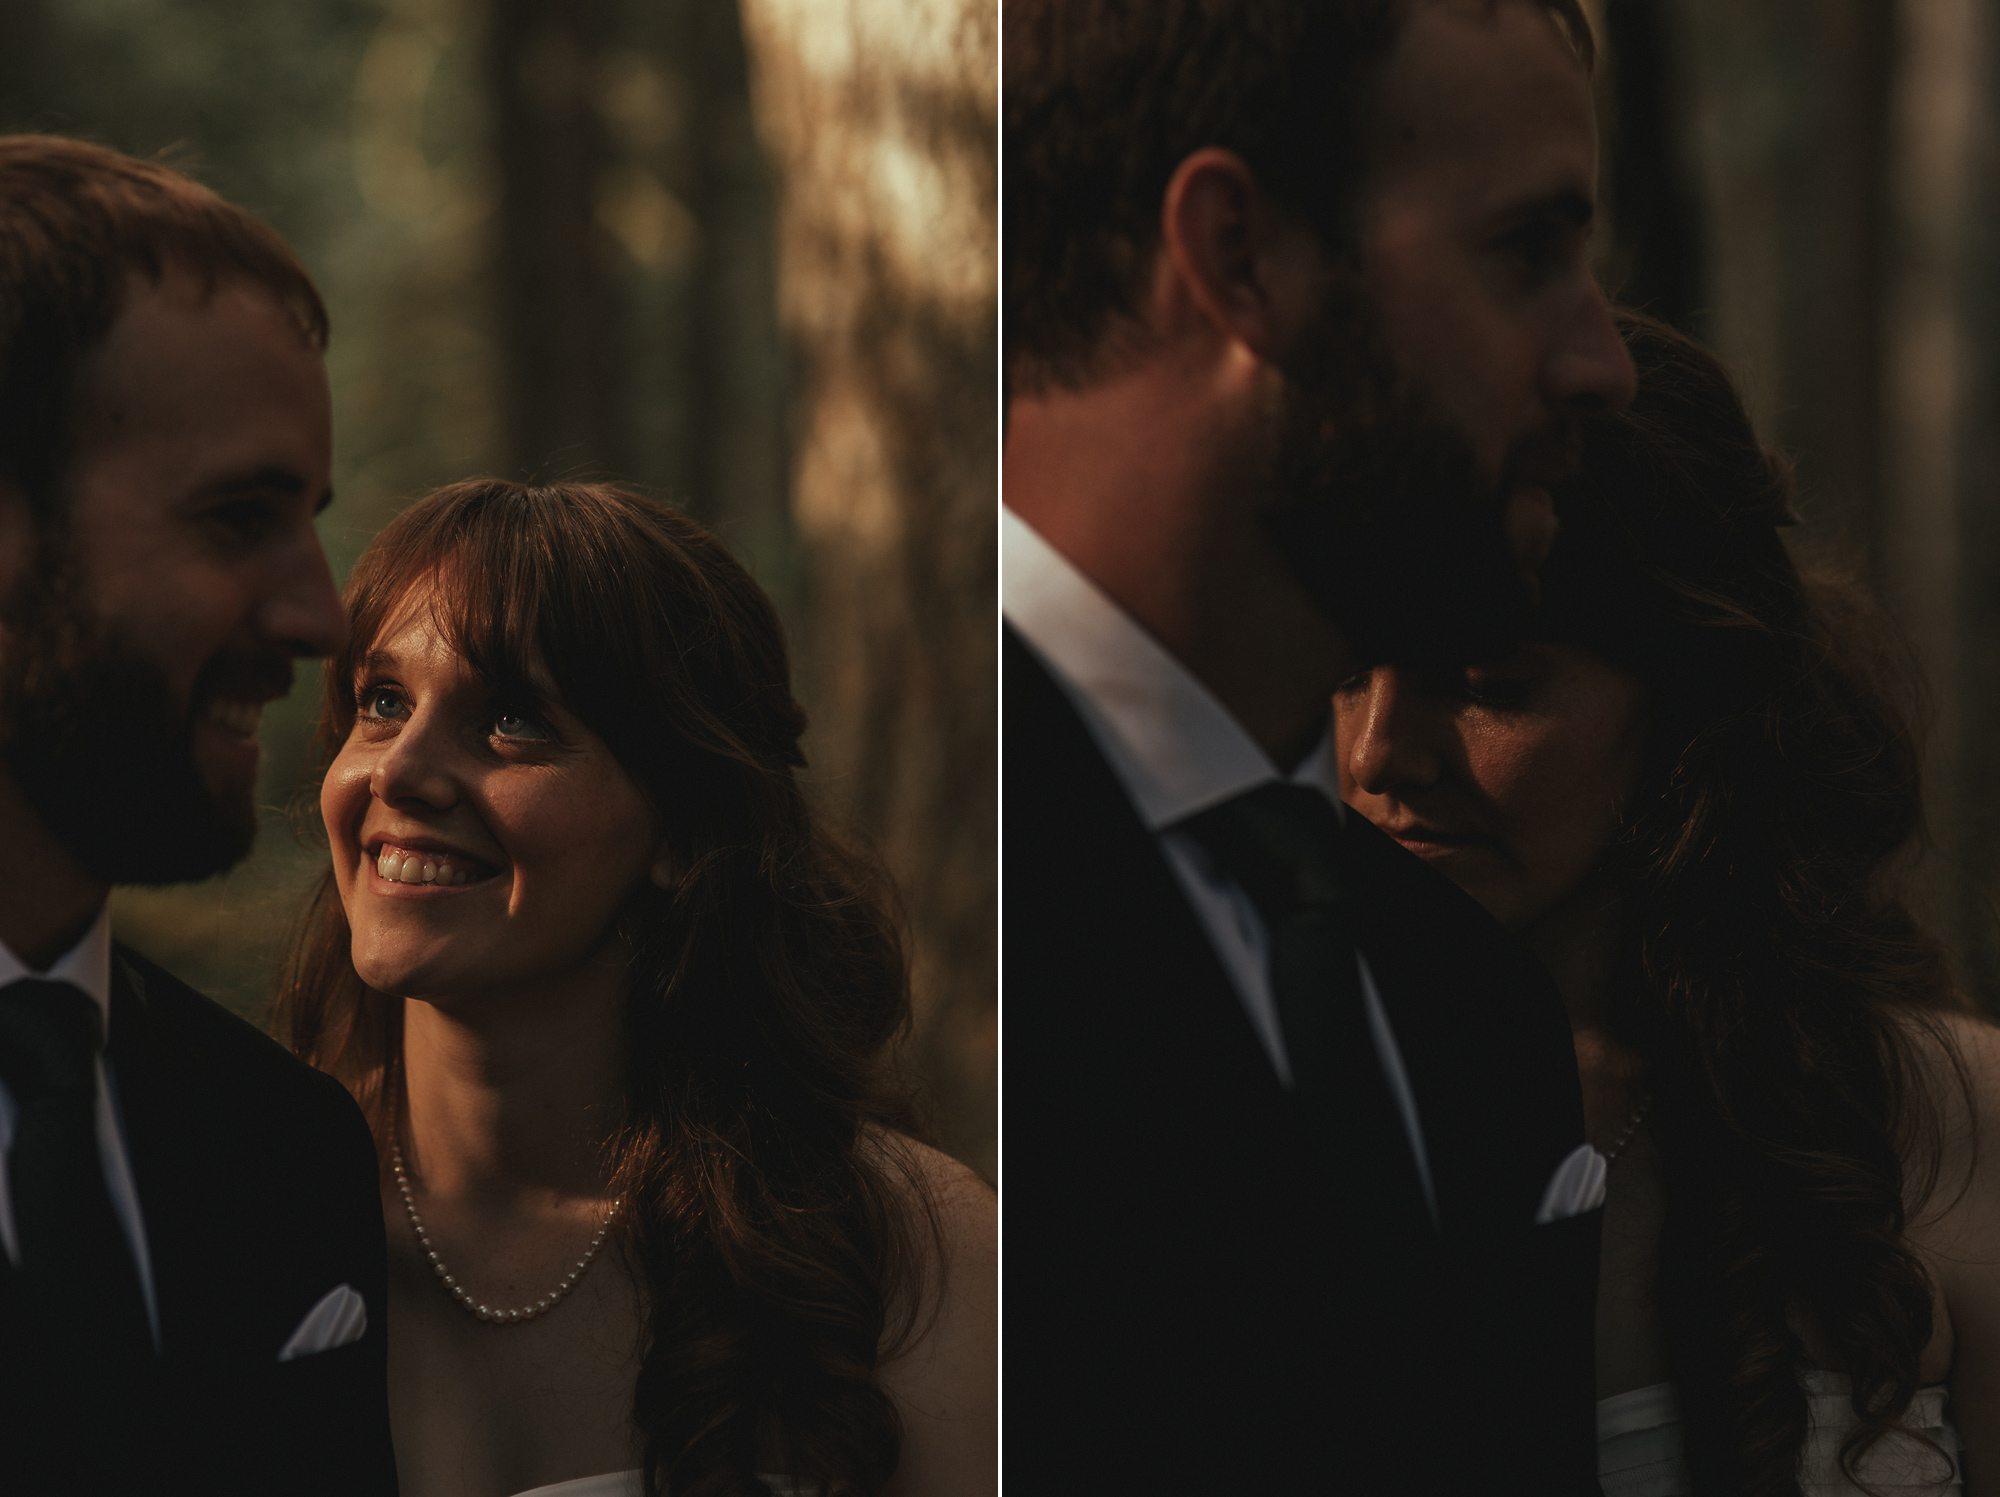 gibsons-wedding-photography-robert-devon35